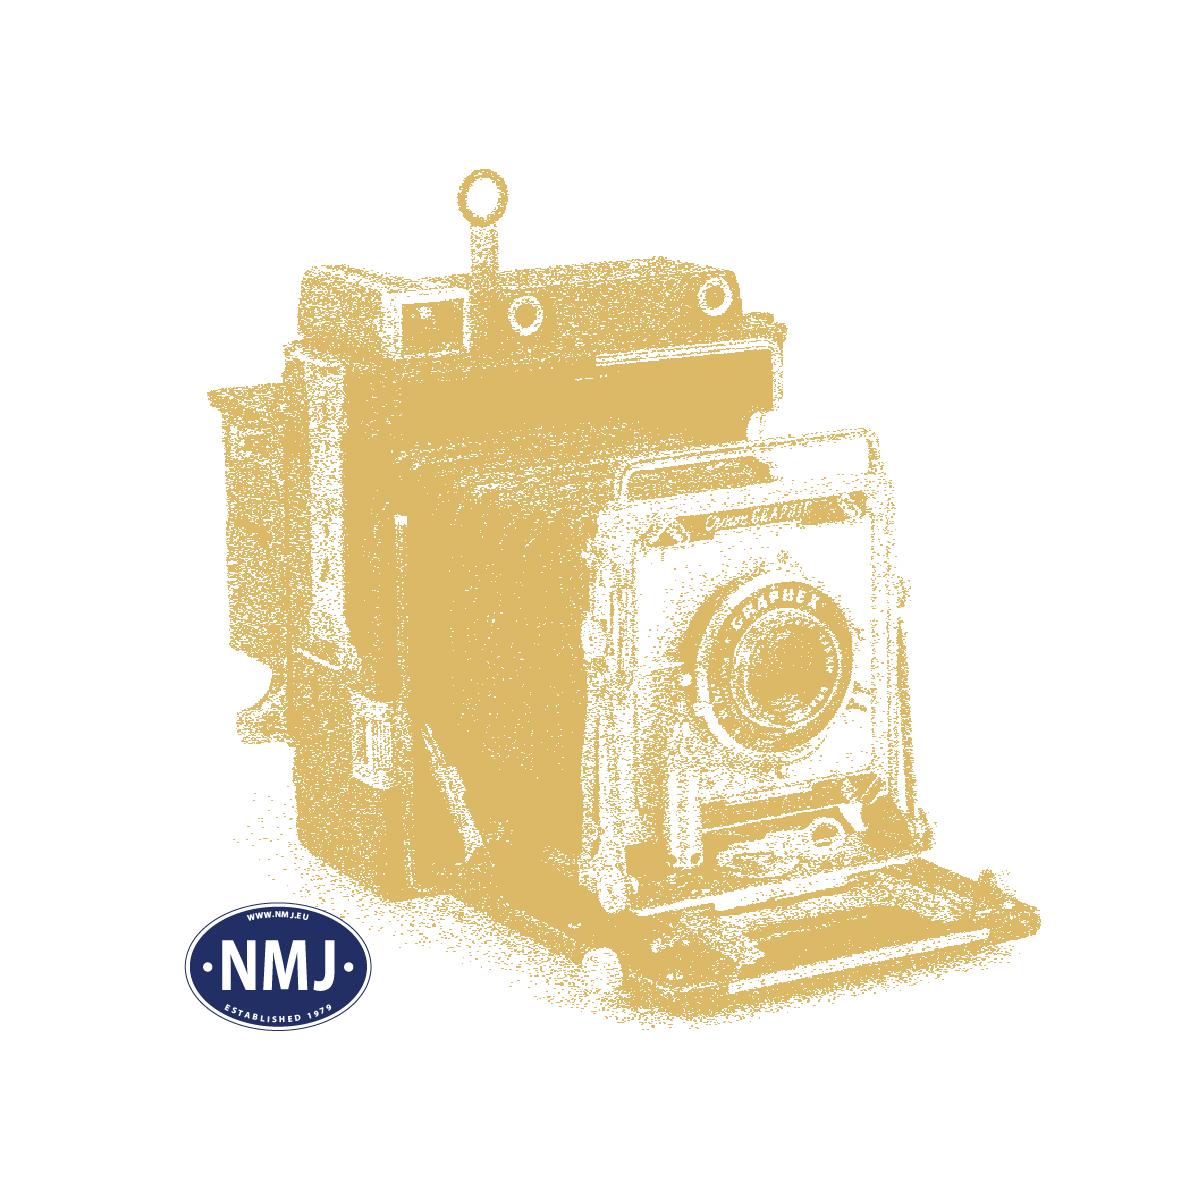 NOC07152 - Løv, Lys Grønn